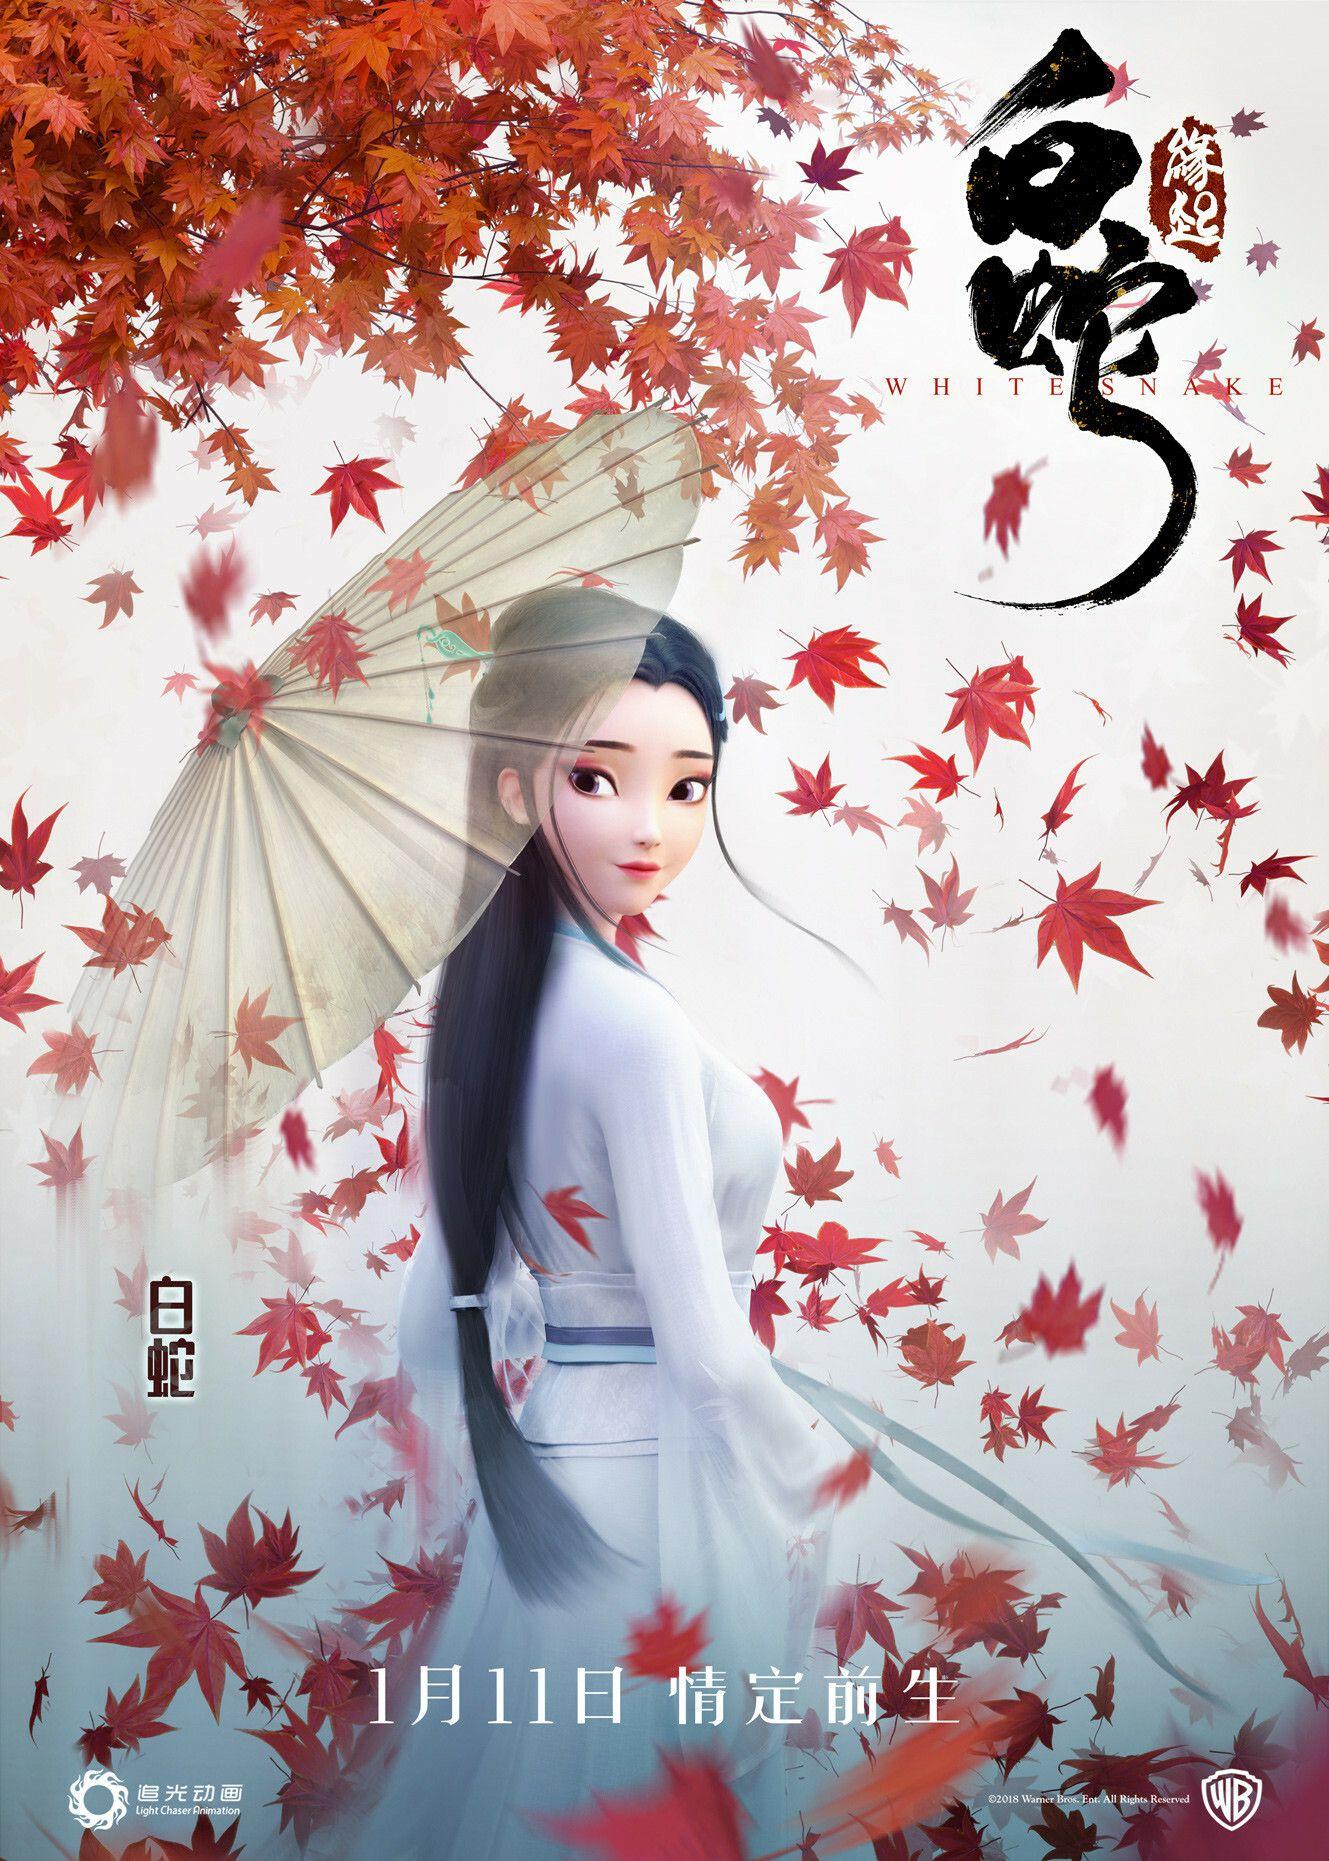 ArtStation WHITE SNAKE Blanca poster, yw tang ในปี